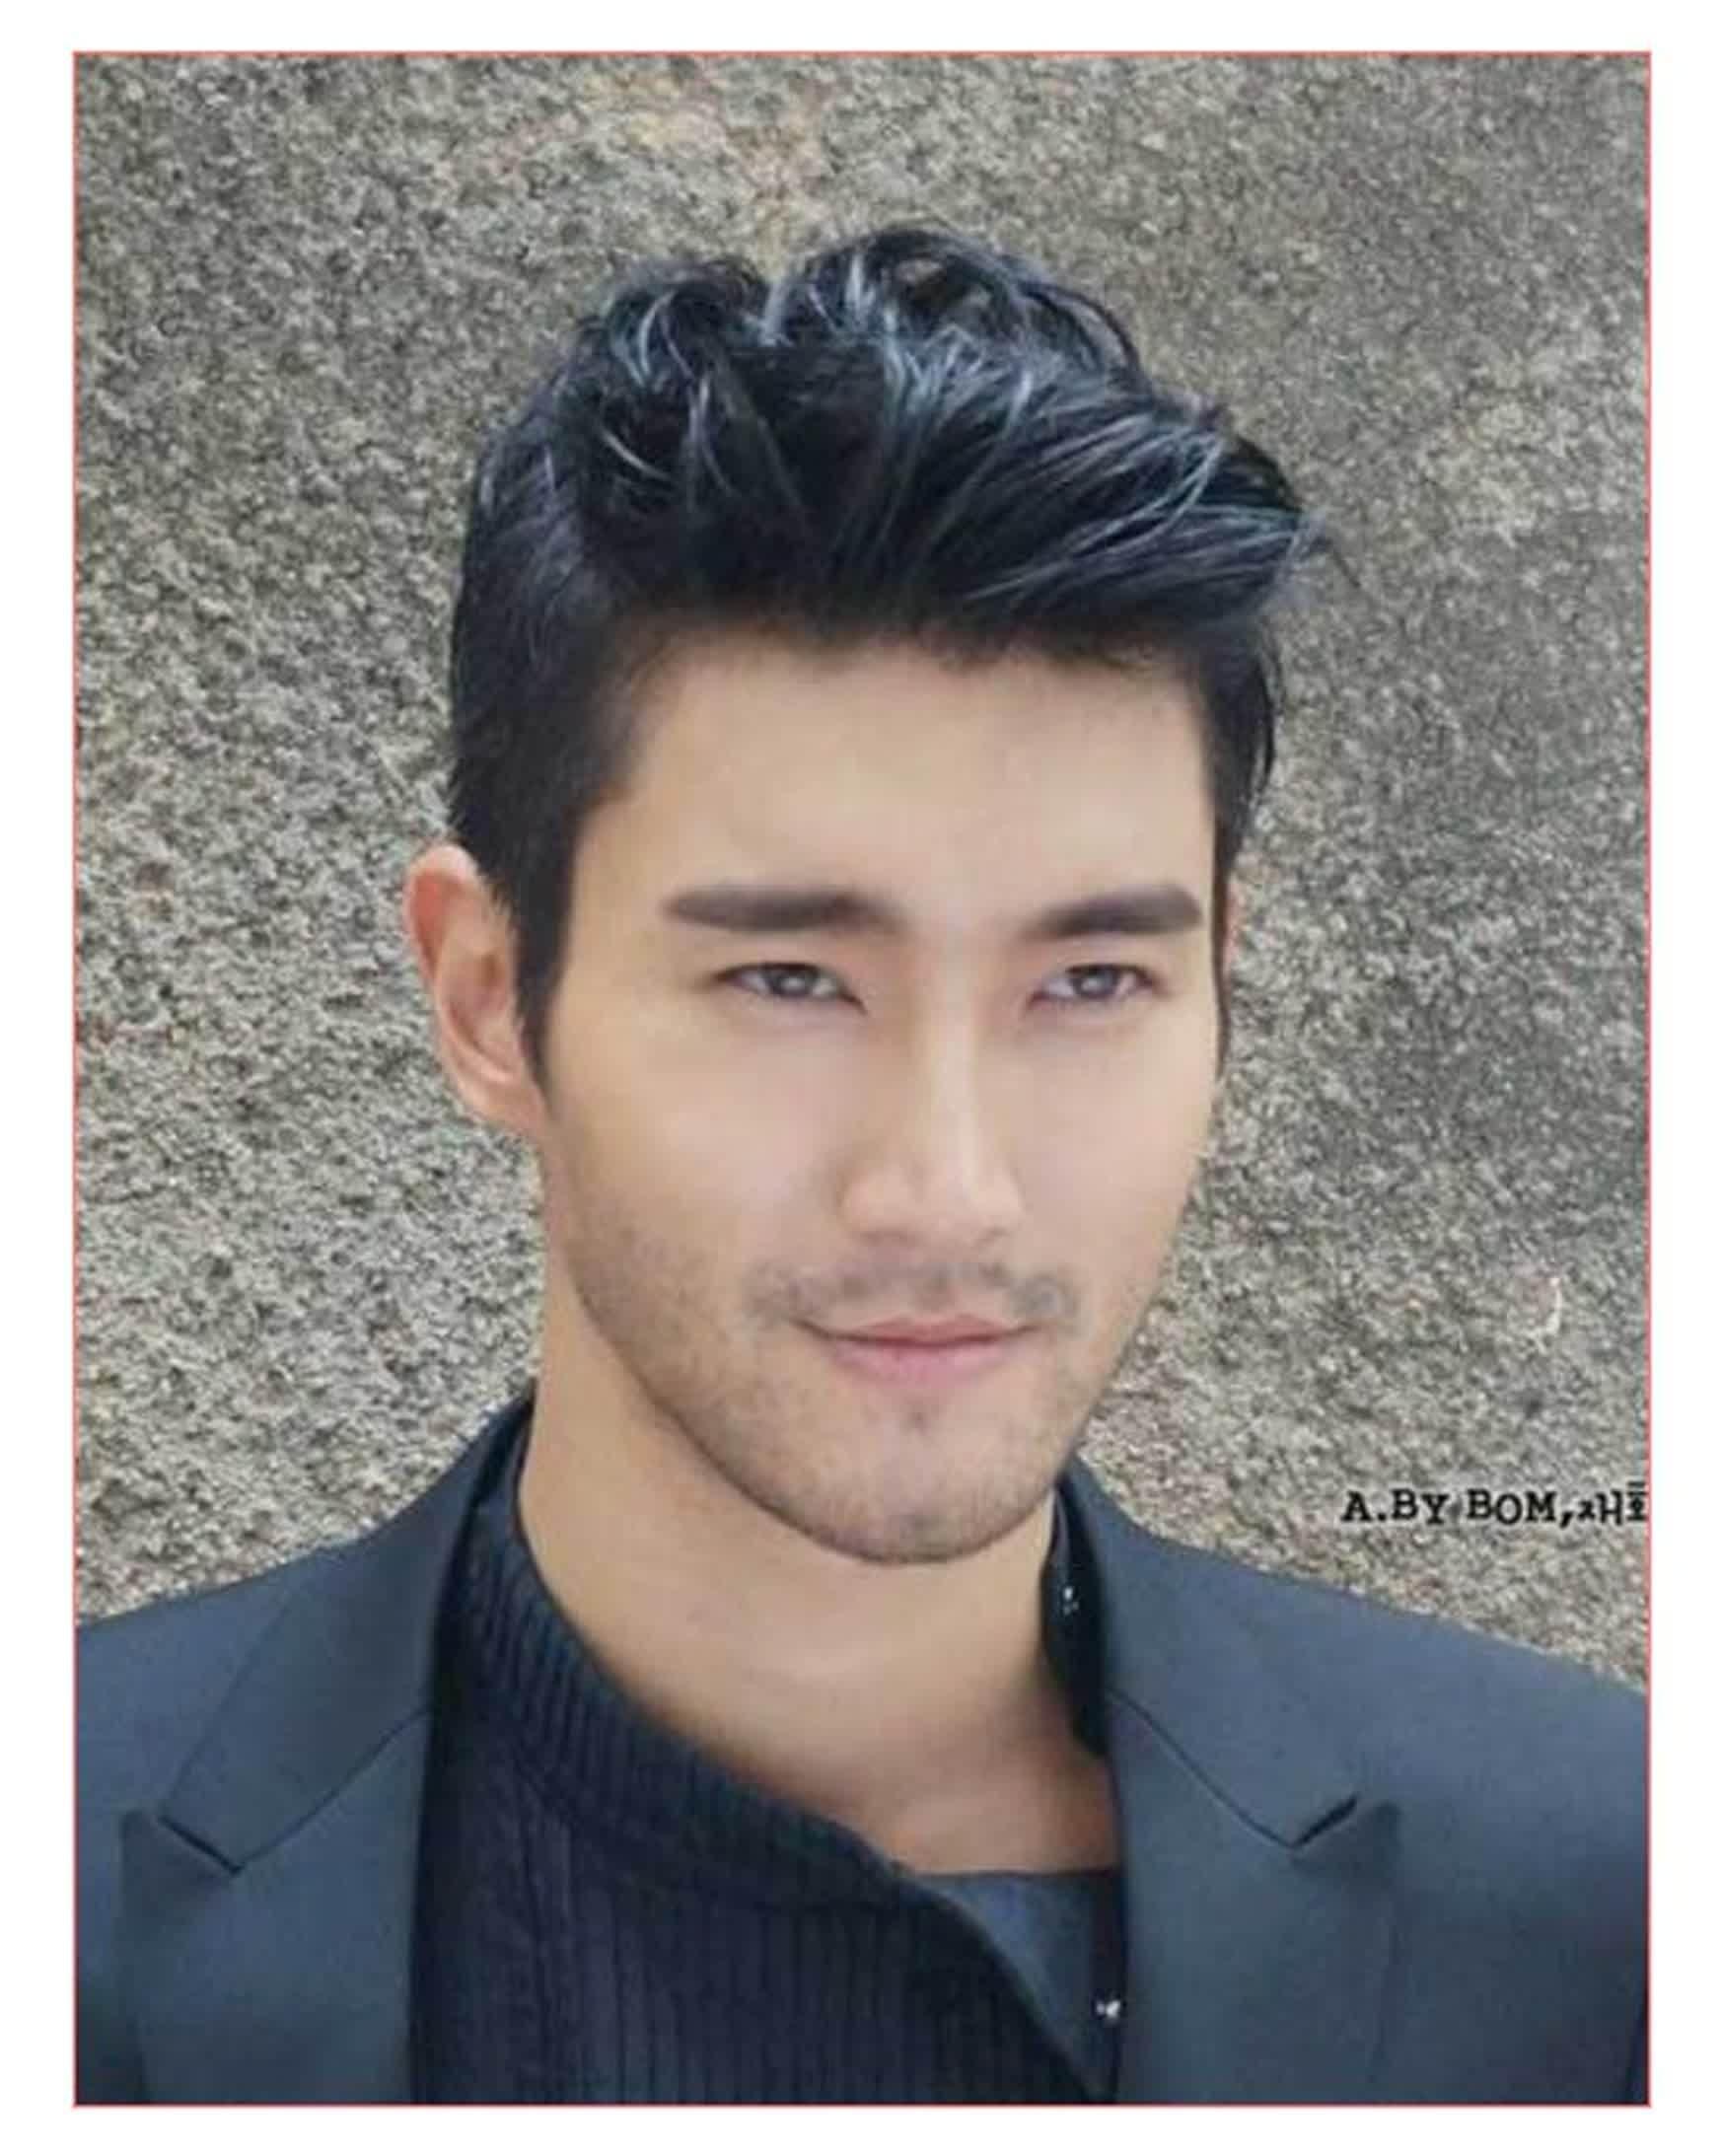 Asiatische Manner Frisur Neu Haar Frisuren 2018 Asiatische Frisuren Asiatischer Haarschnitt Asiatische Herrenfrisuren